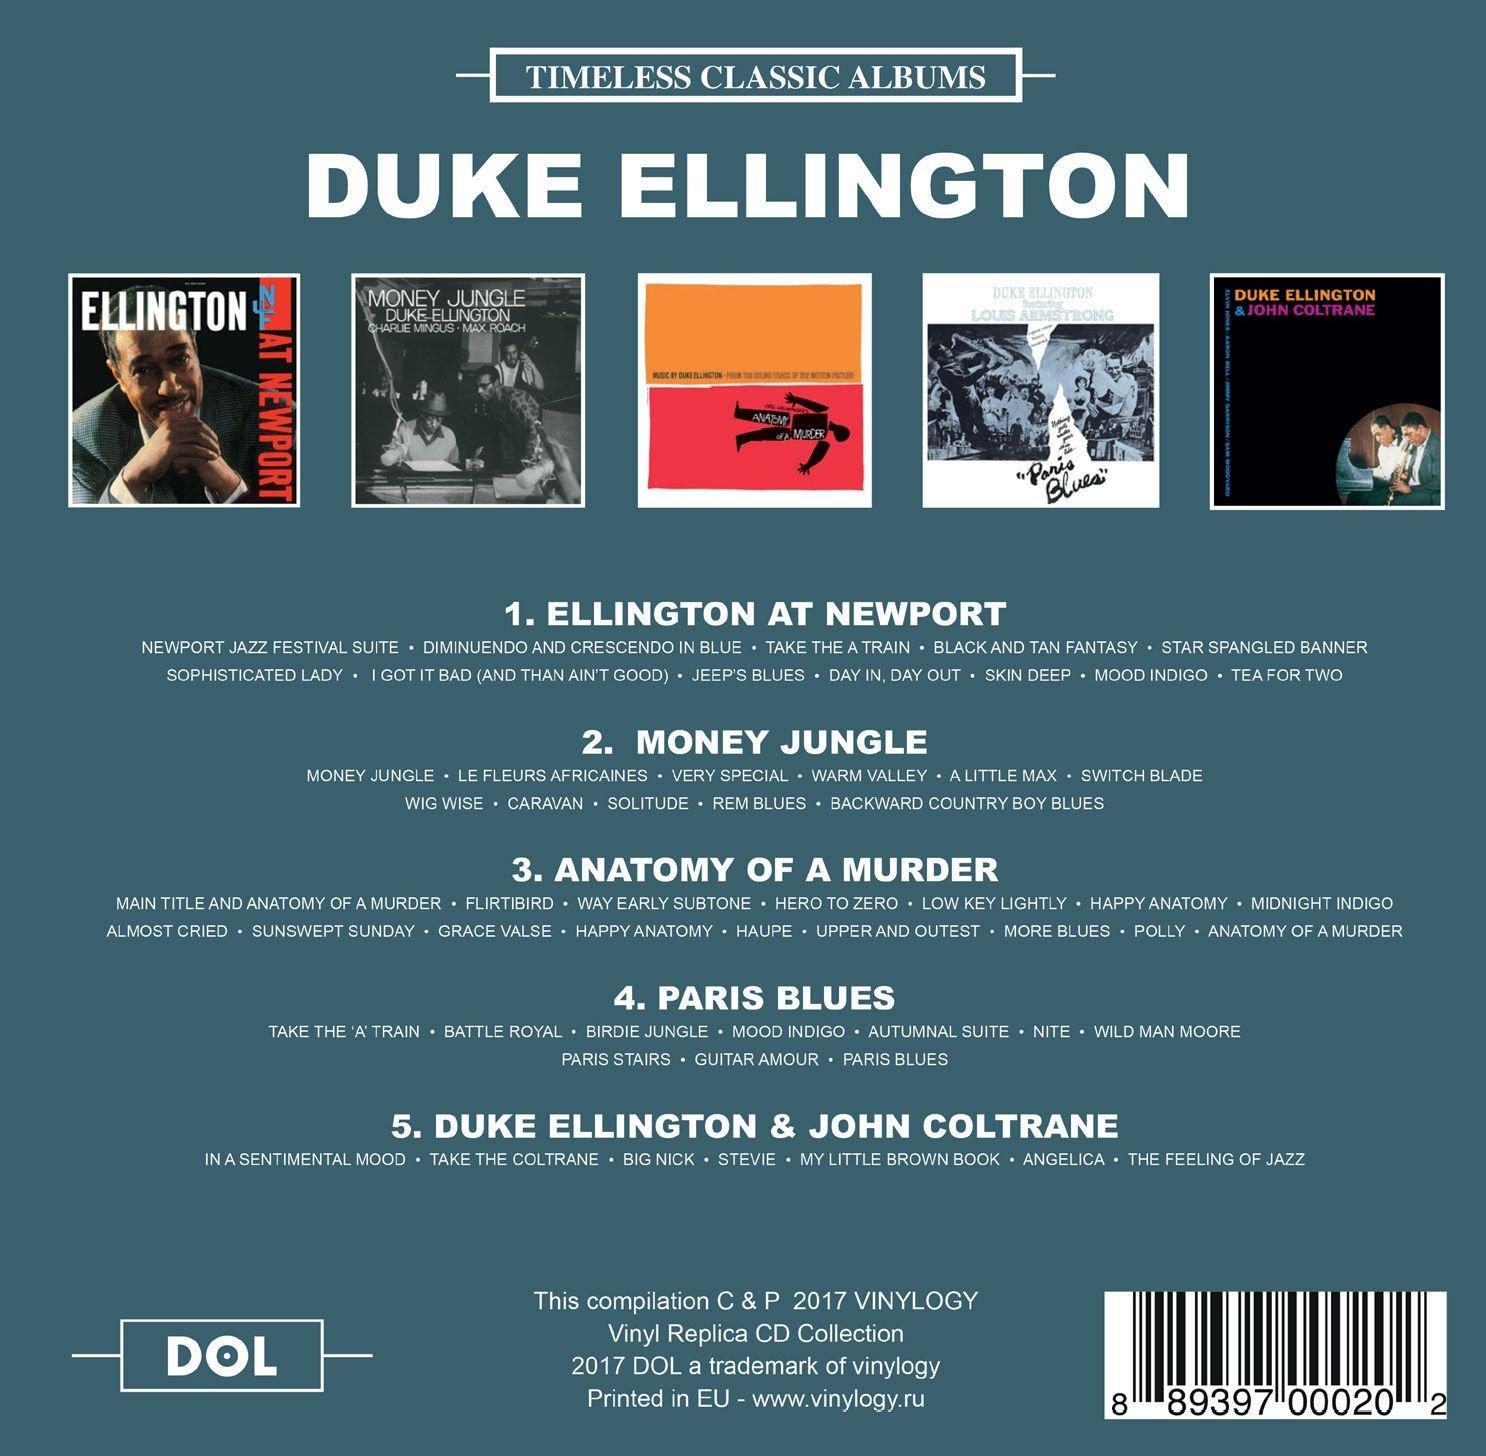 DUKE ELLINGTON - Timeless Classic Albums - Amazon.com Music